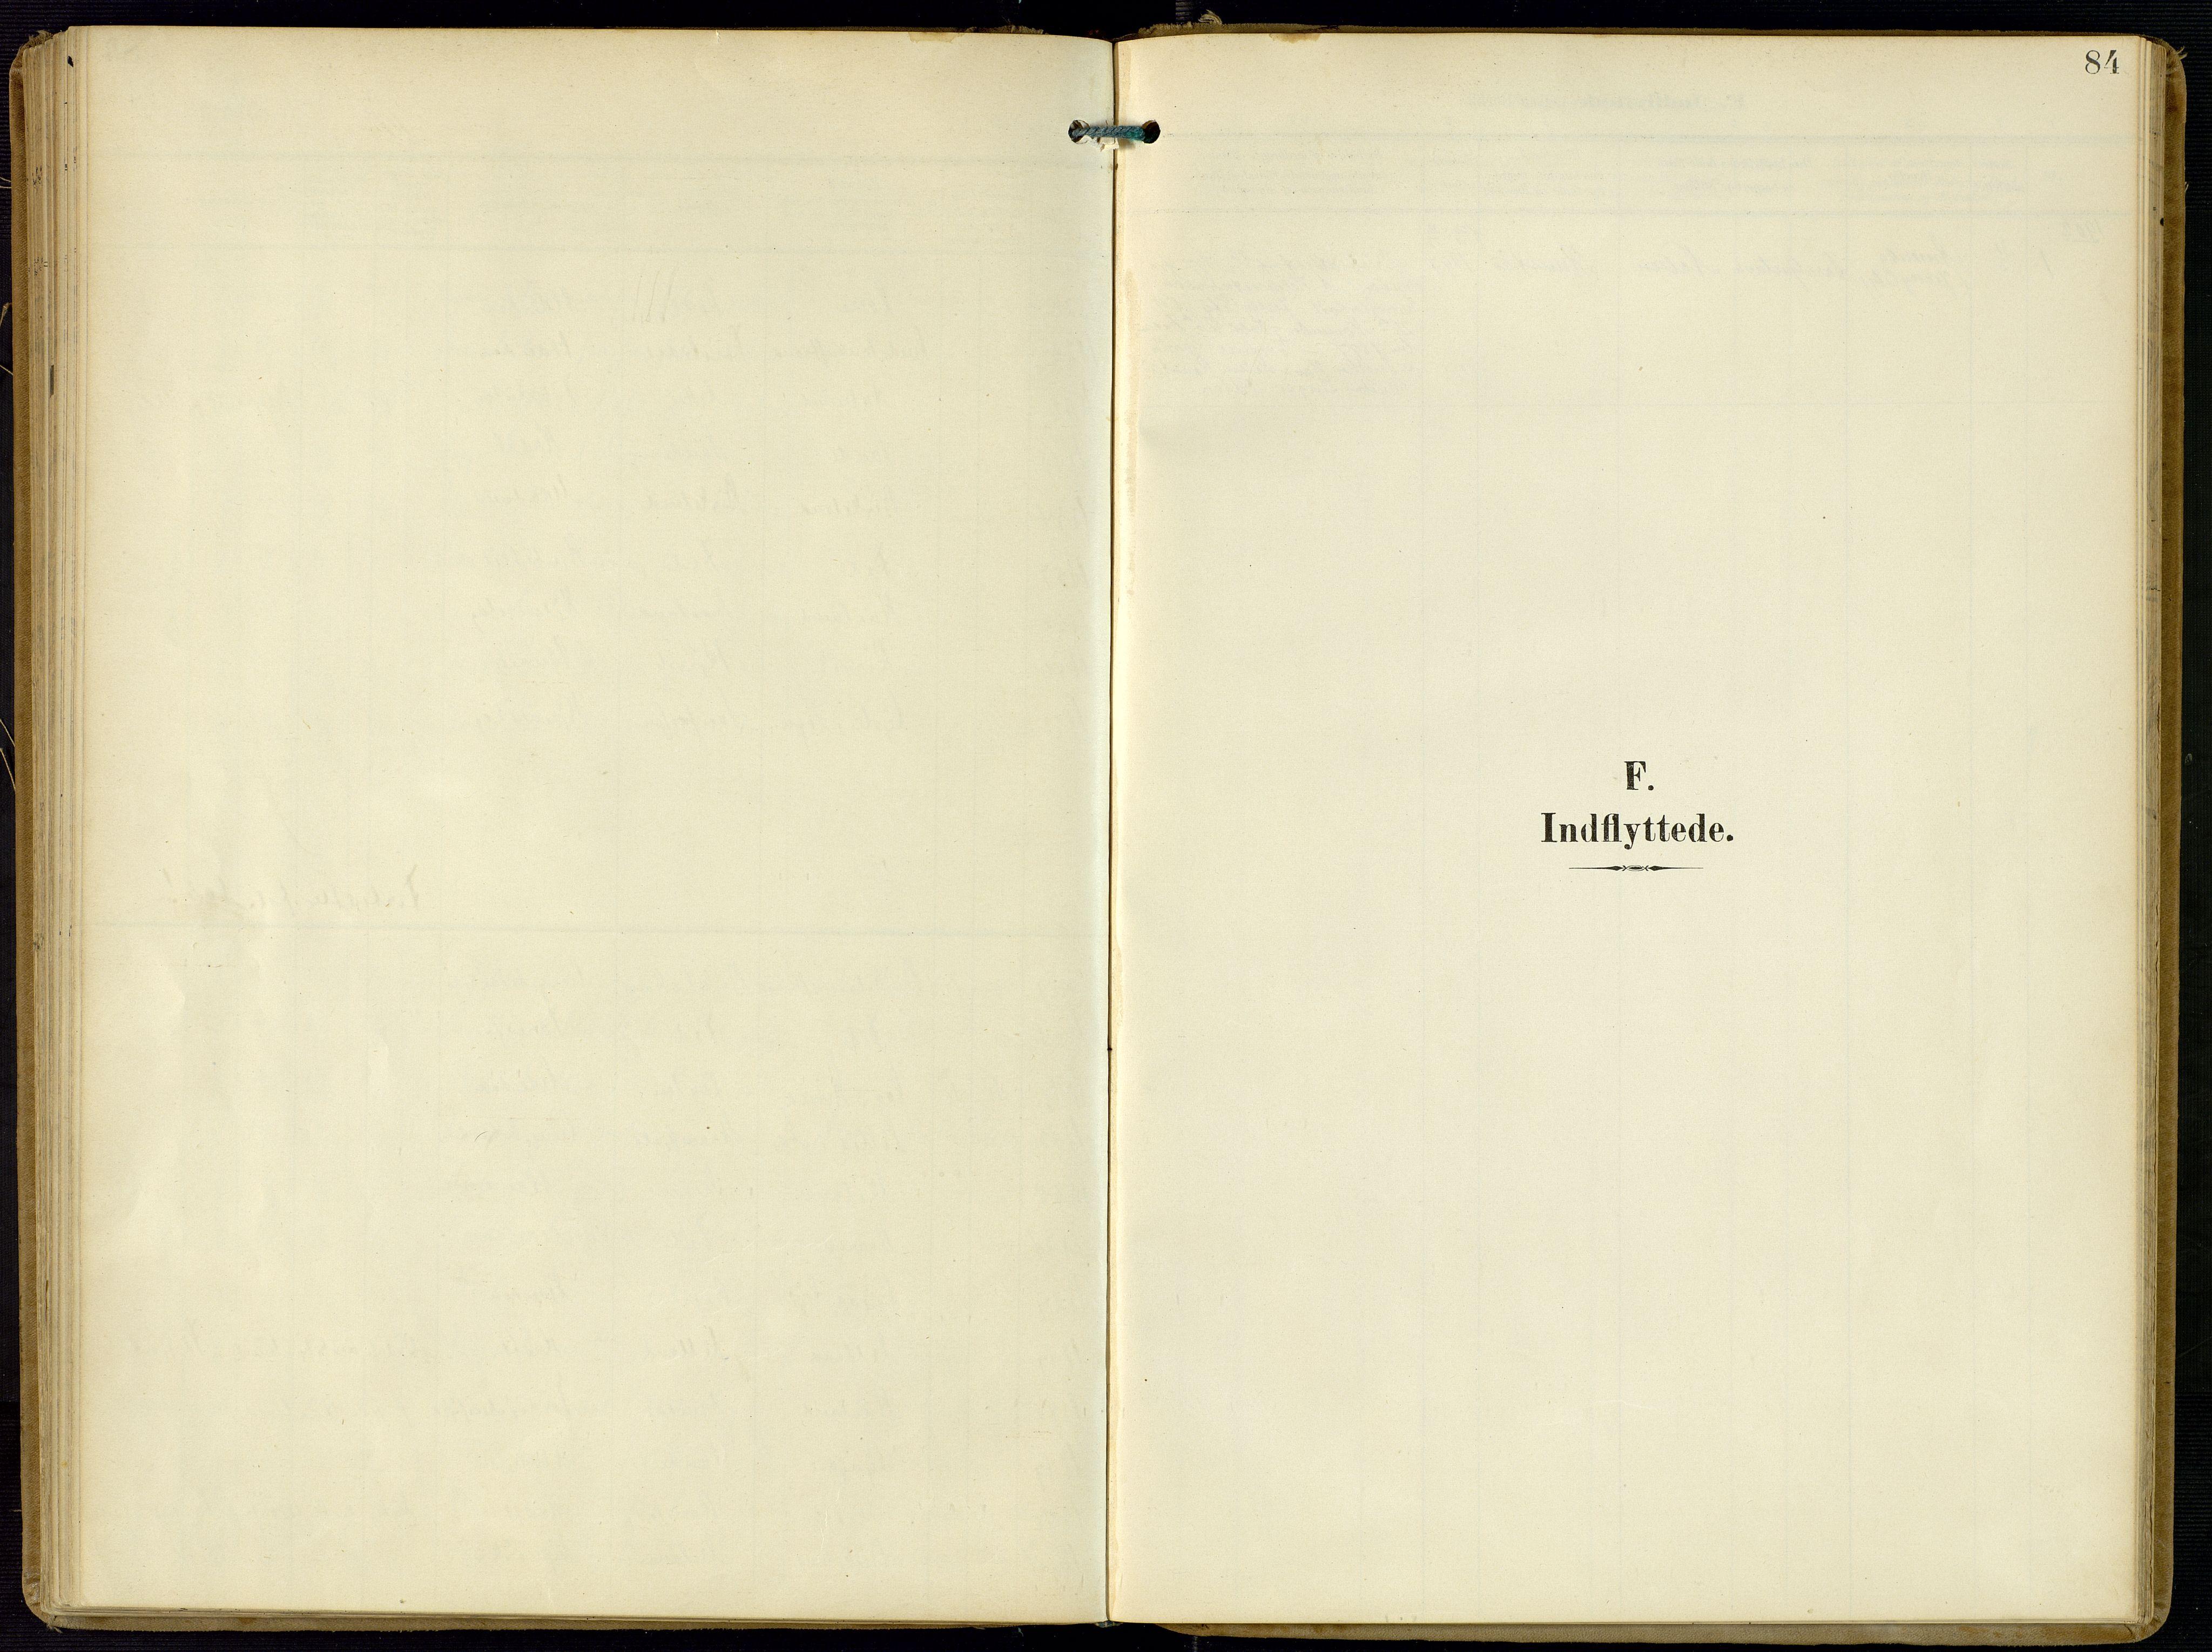 SAK, Kvinesdal sokneprestkontor, F/Fa/Faa/L0005: Ministerialbok nr. A 5, 1898-1915, s. 84